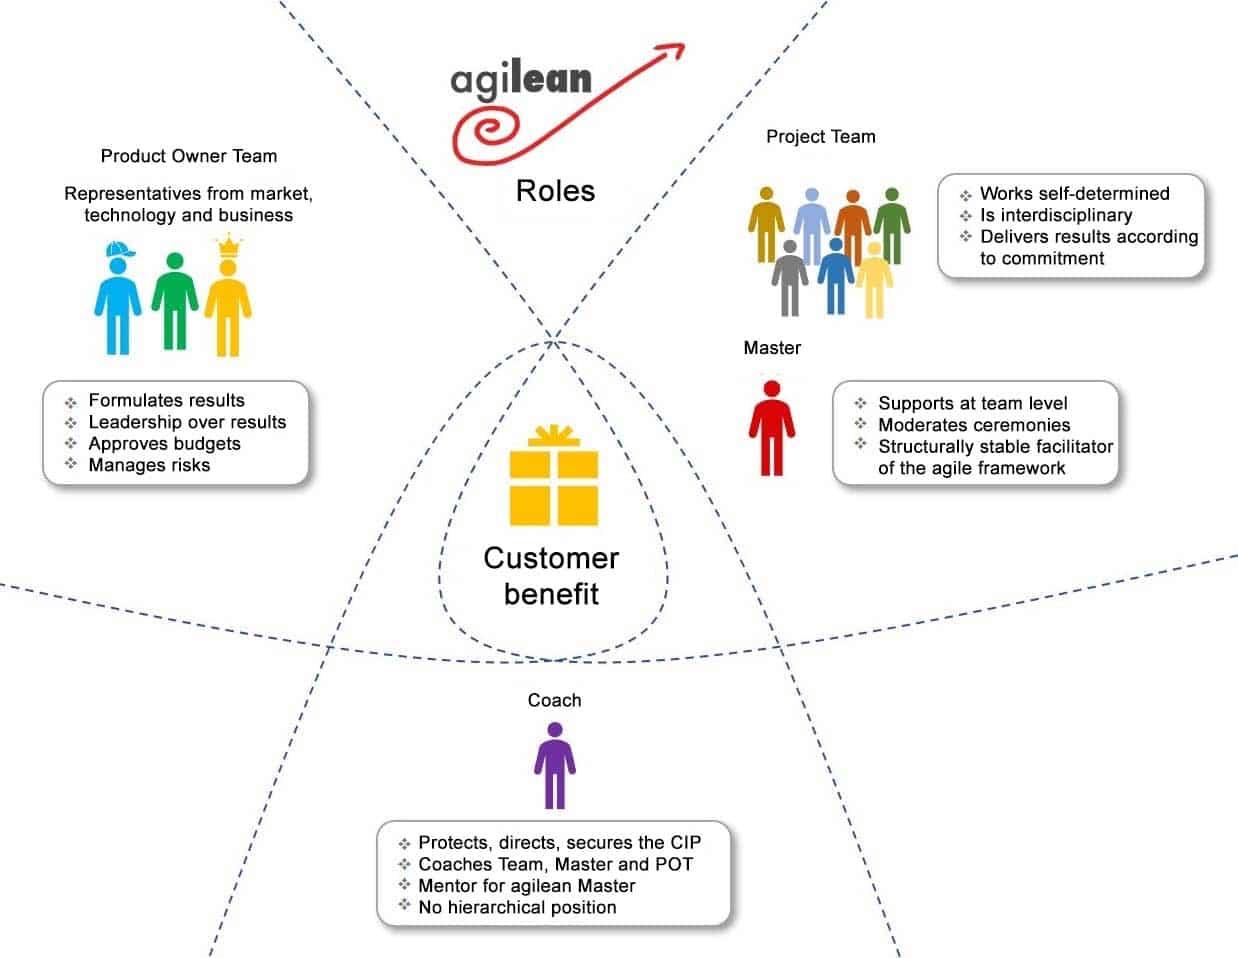 Agilean Roles